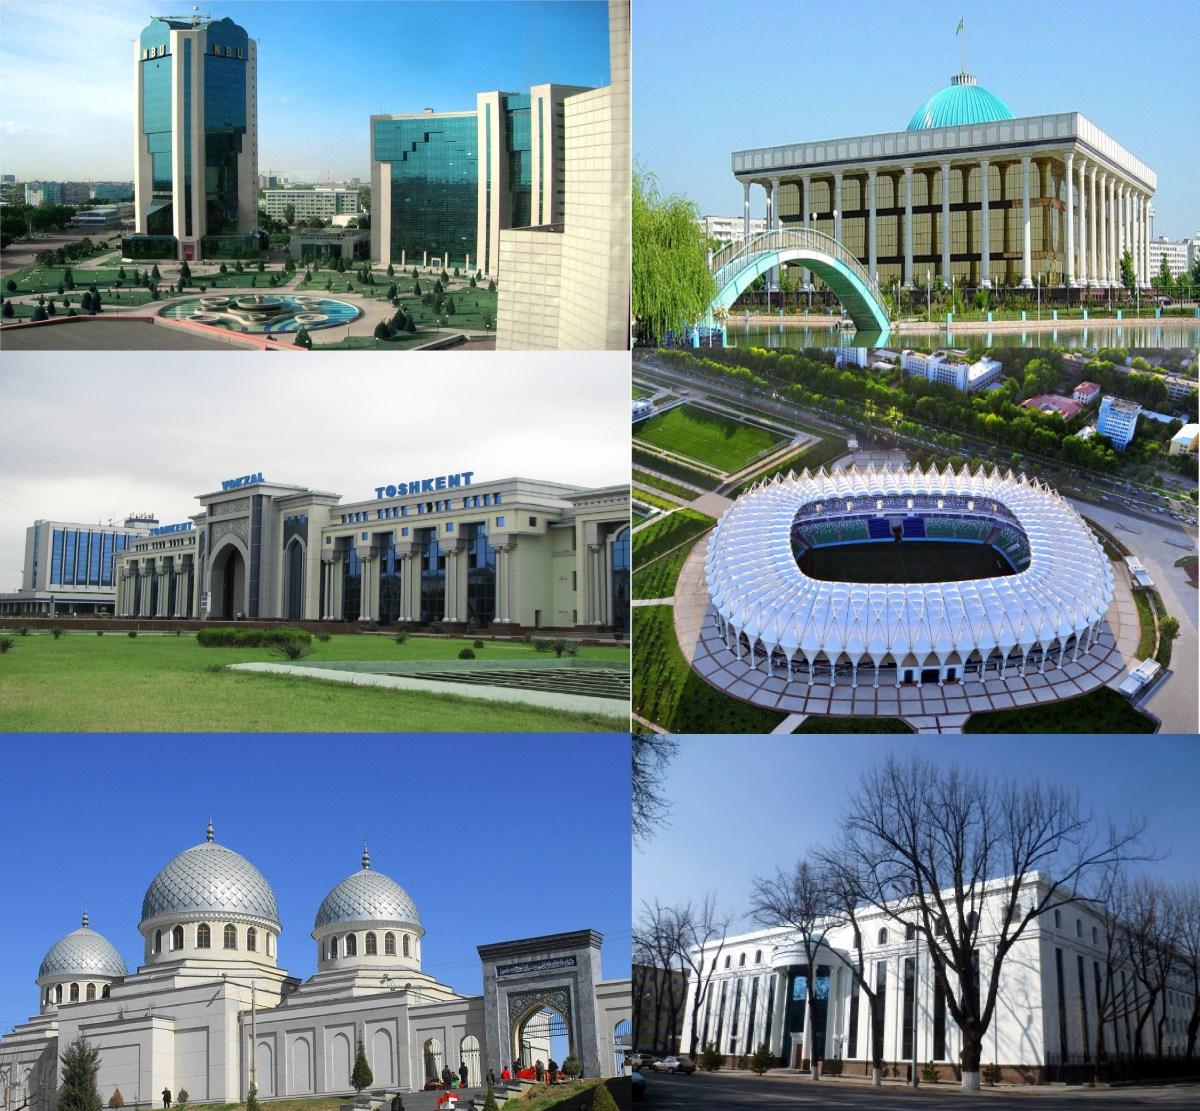 Tashkent_City_Collage_2014